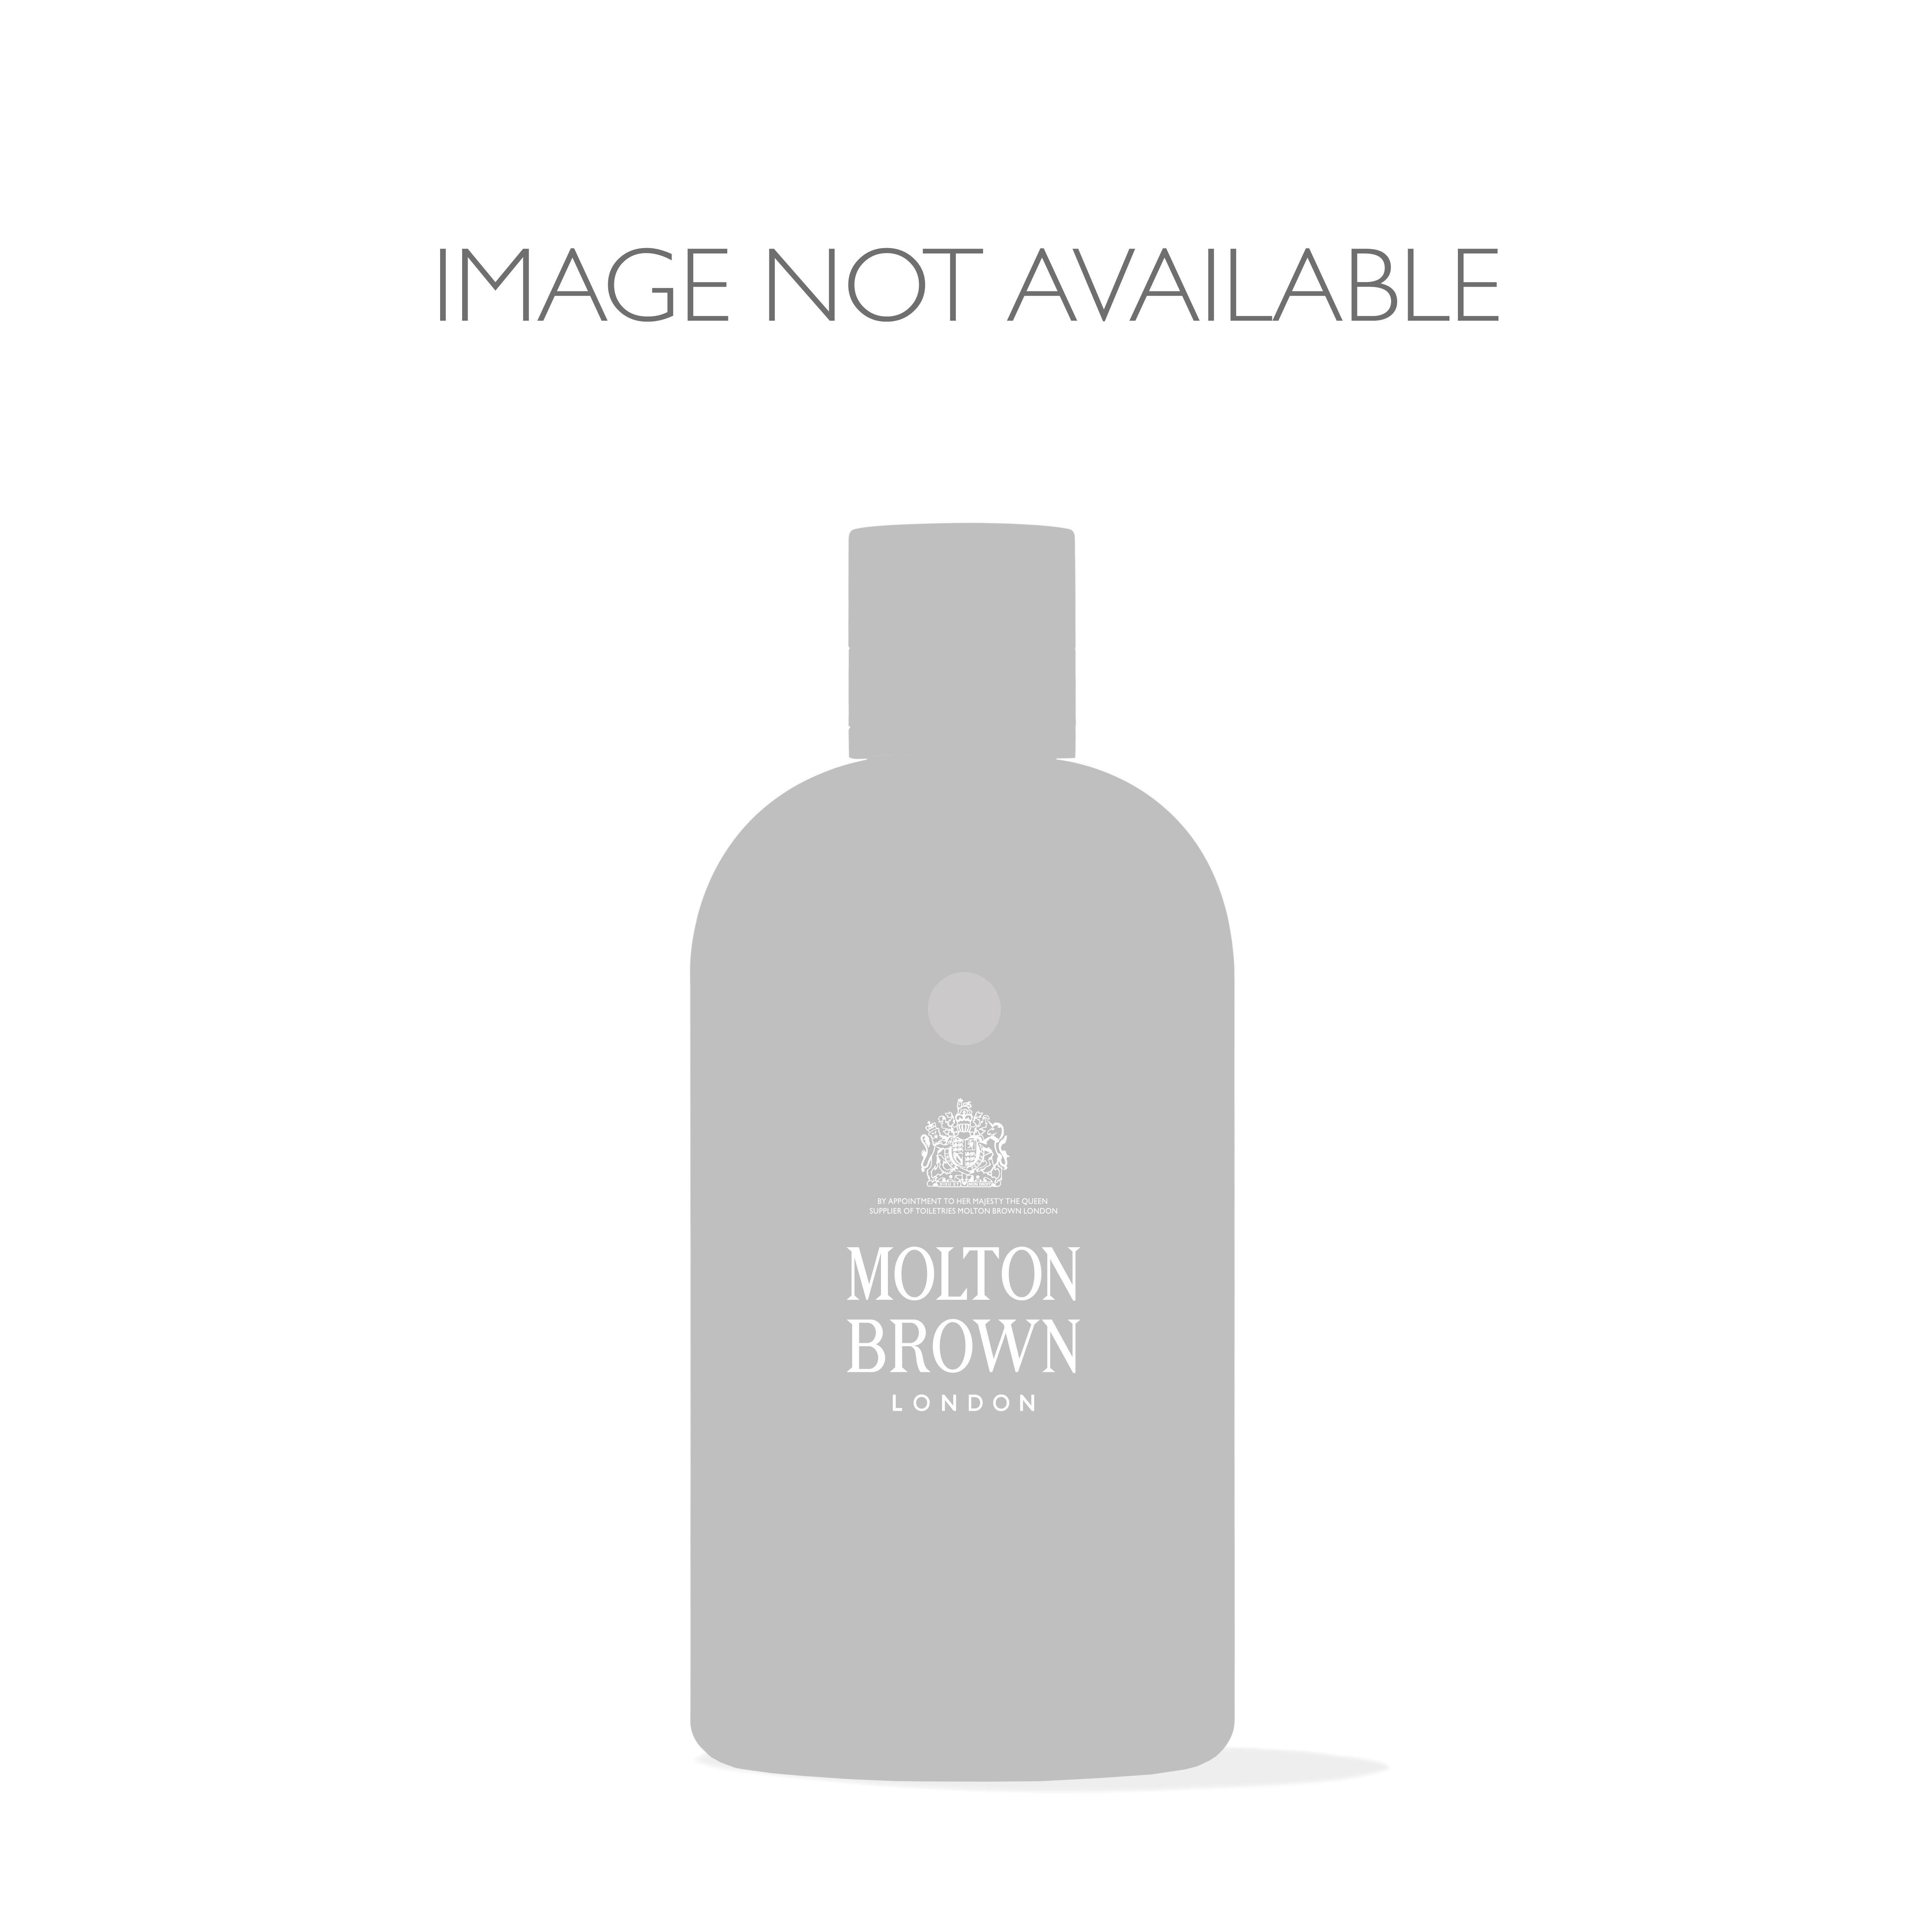 Aktualne Lime & Patchouli Hand Wash   Hand Care   Molton Brown® US HG35